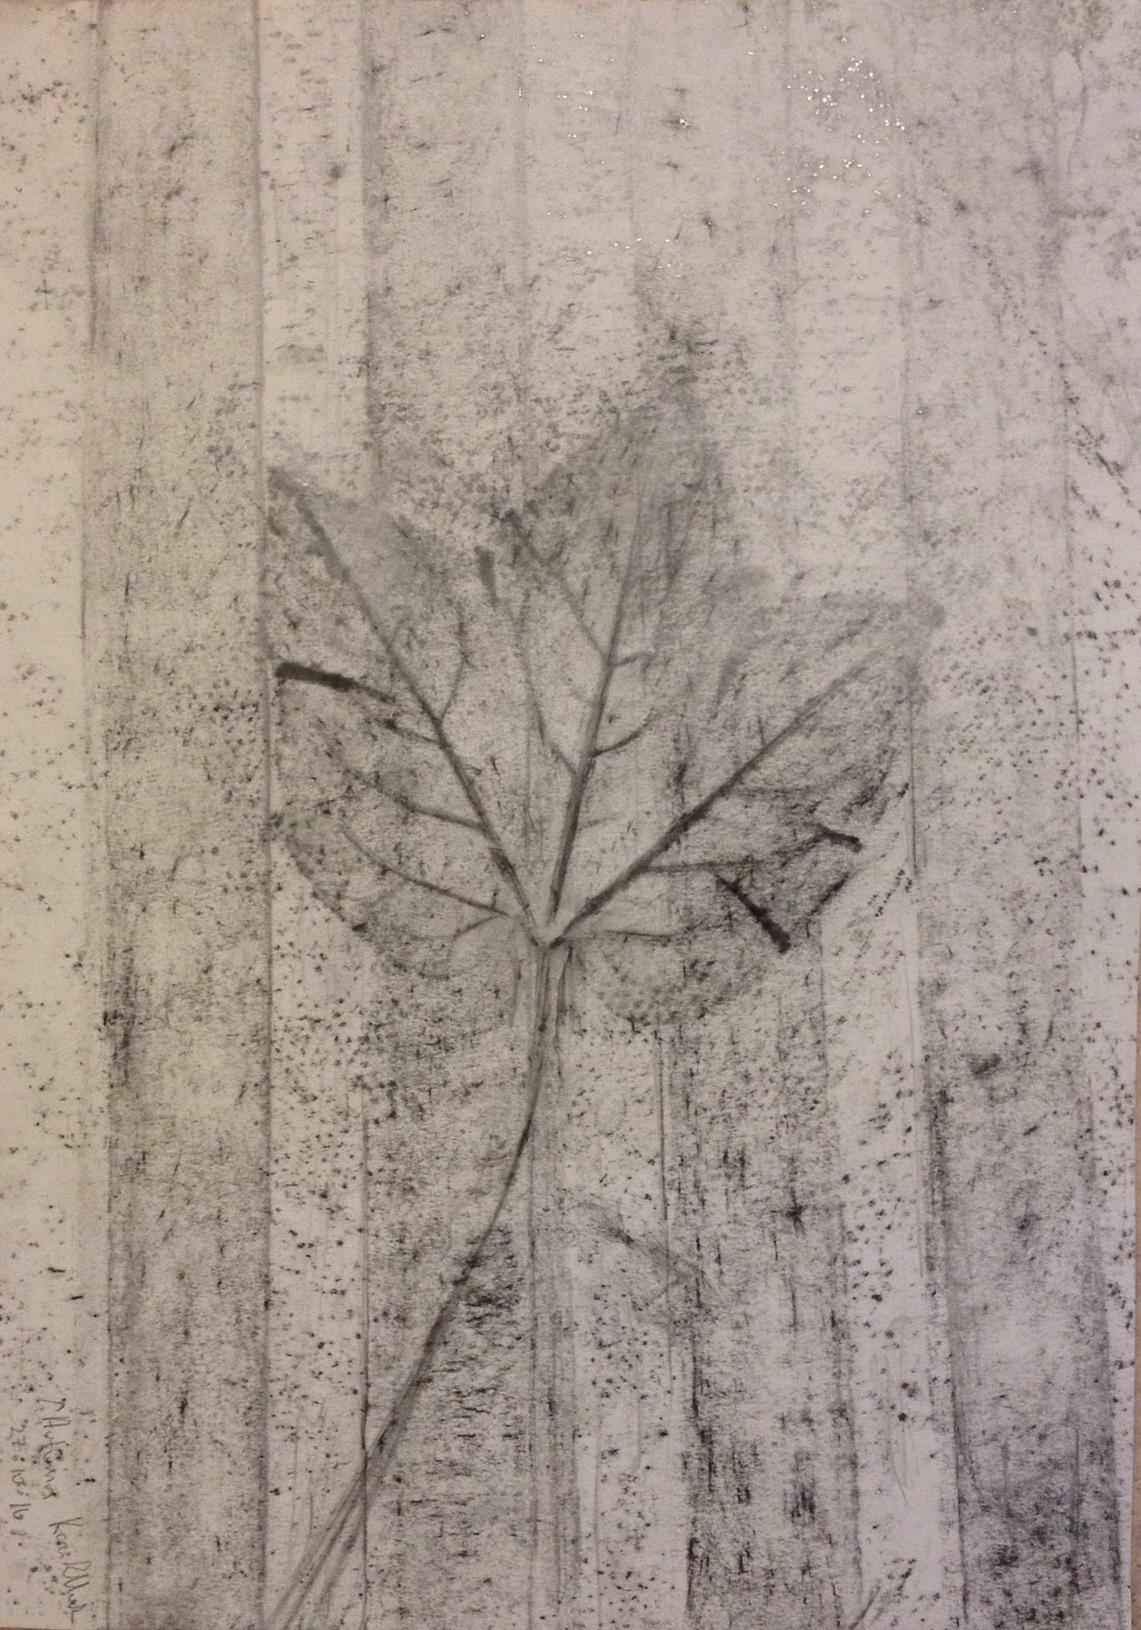 Autumn leaf (2016) graphite on paper